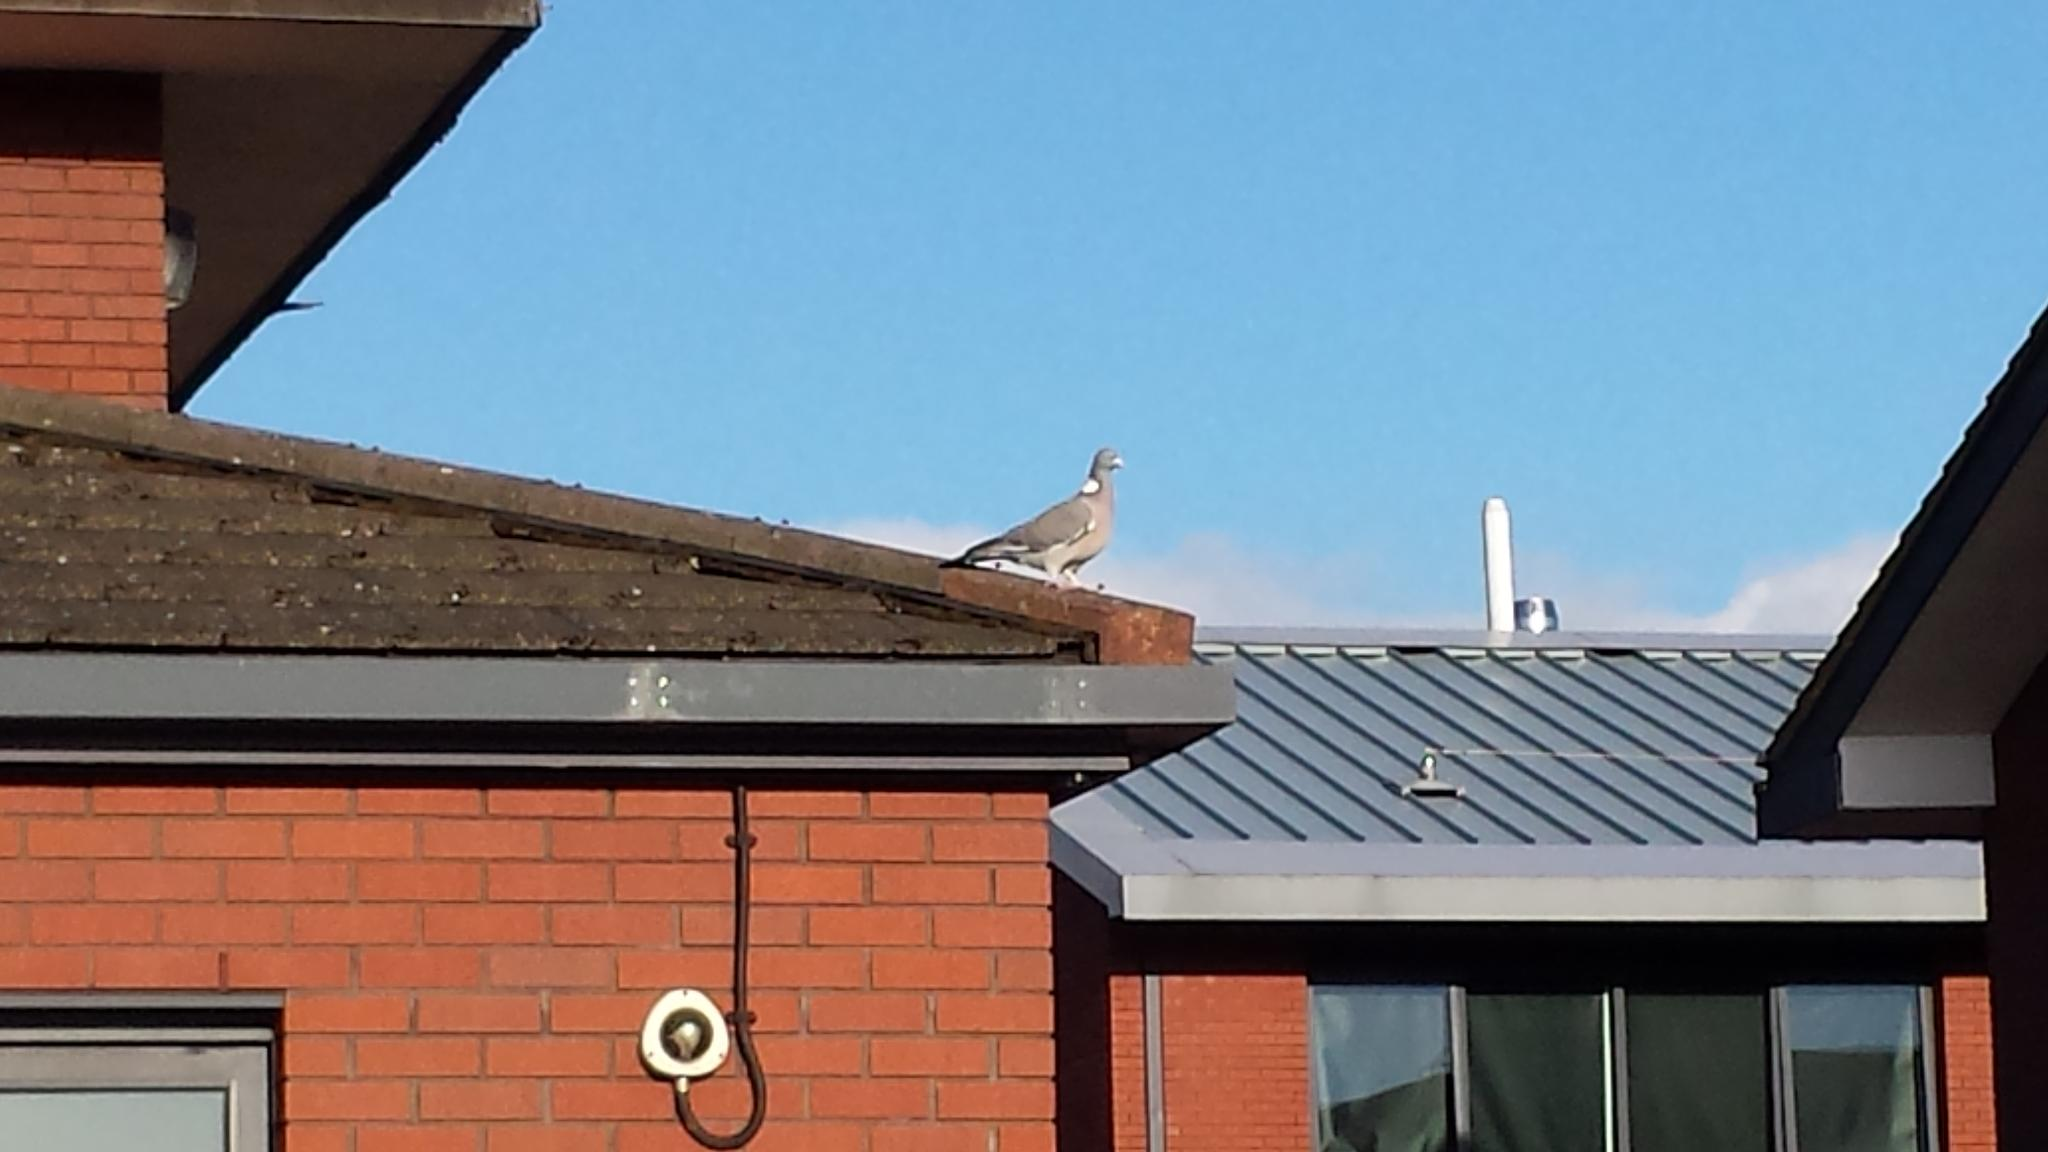 bird on roof top by joshua.f.baralasker